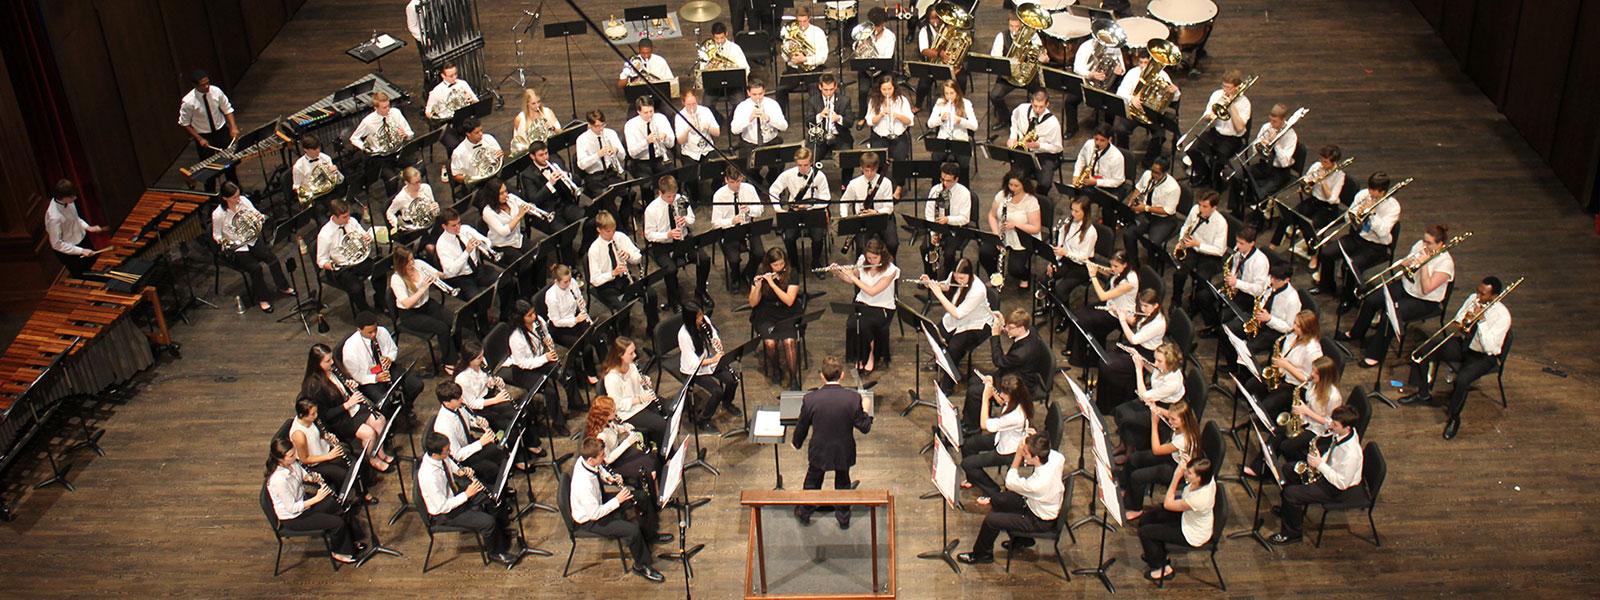 Final Performance Fsu Middle School Band Camp Presented